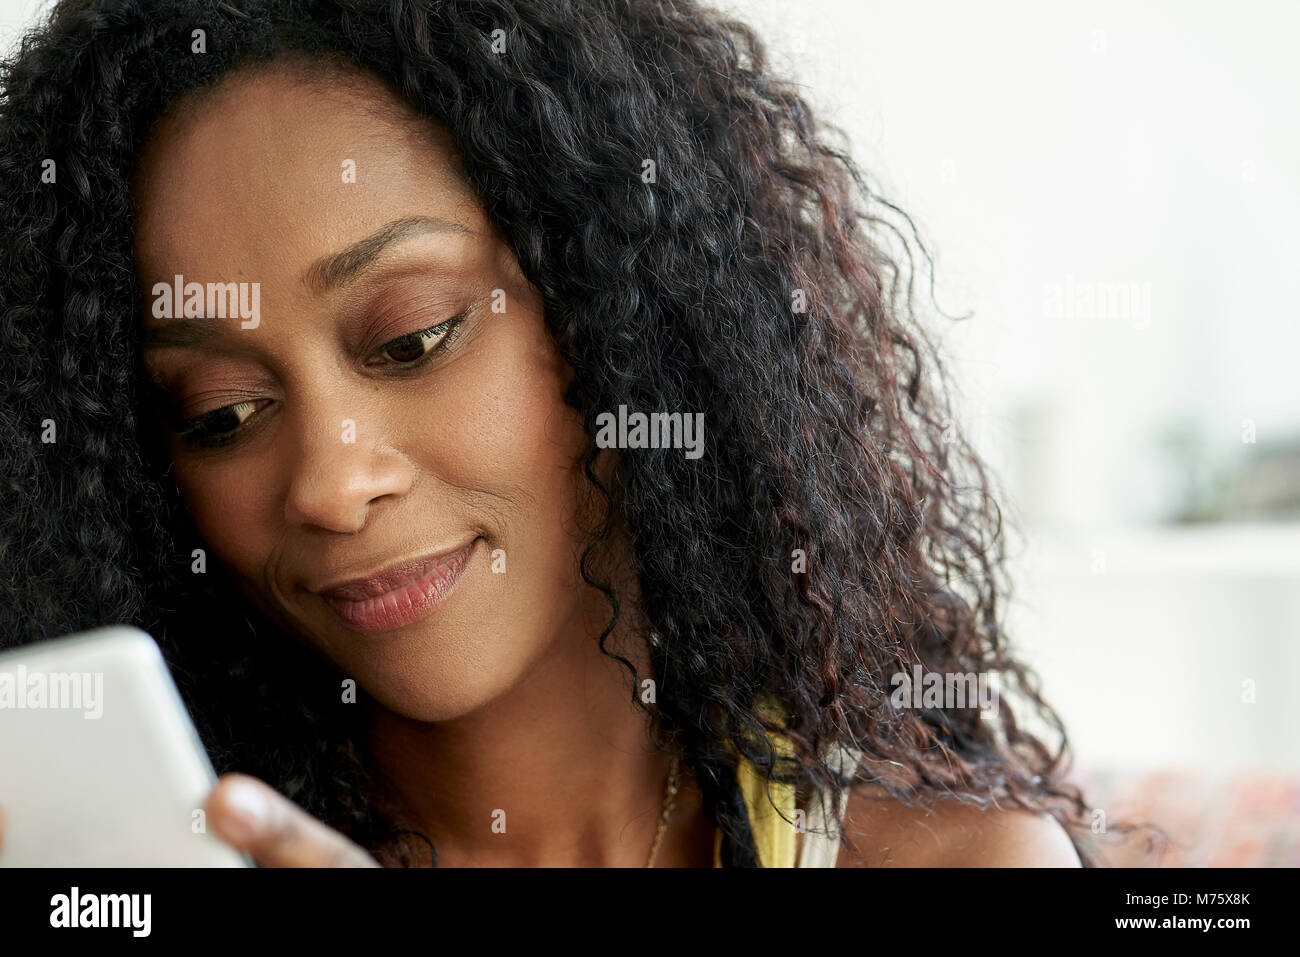 Woman using mobile phone Photo Stock